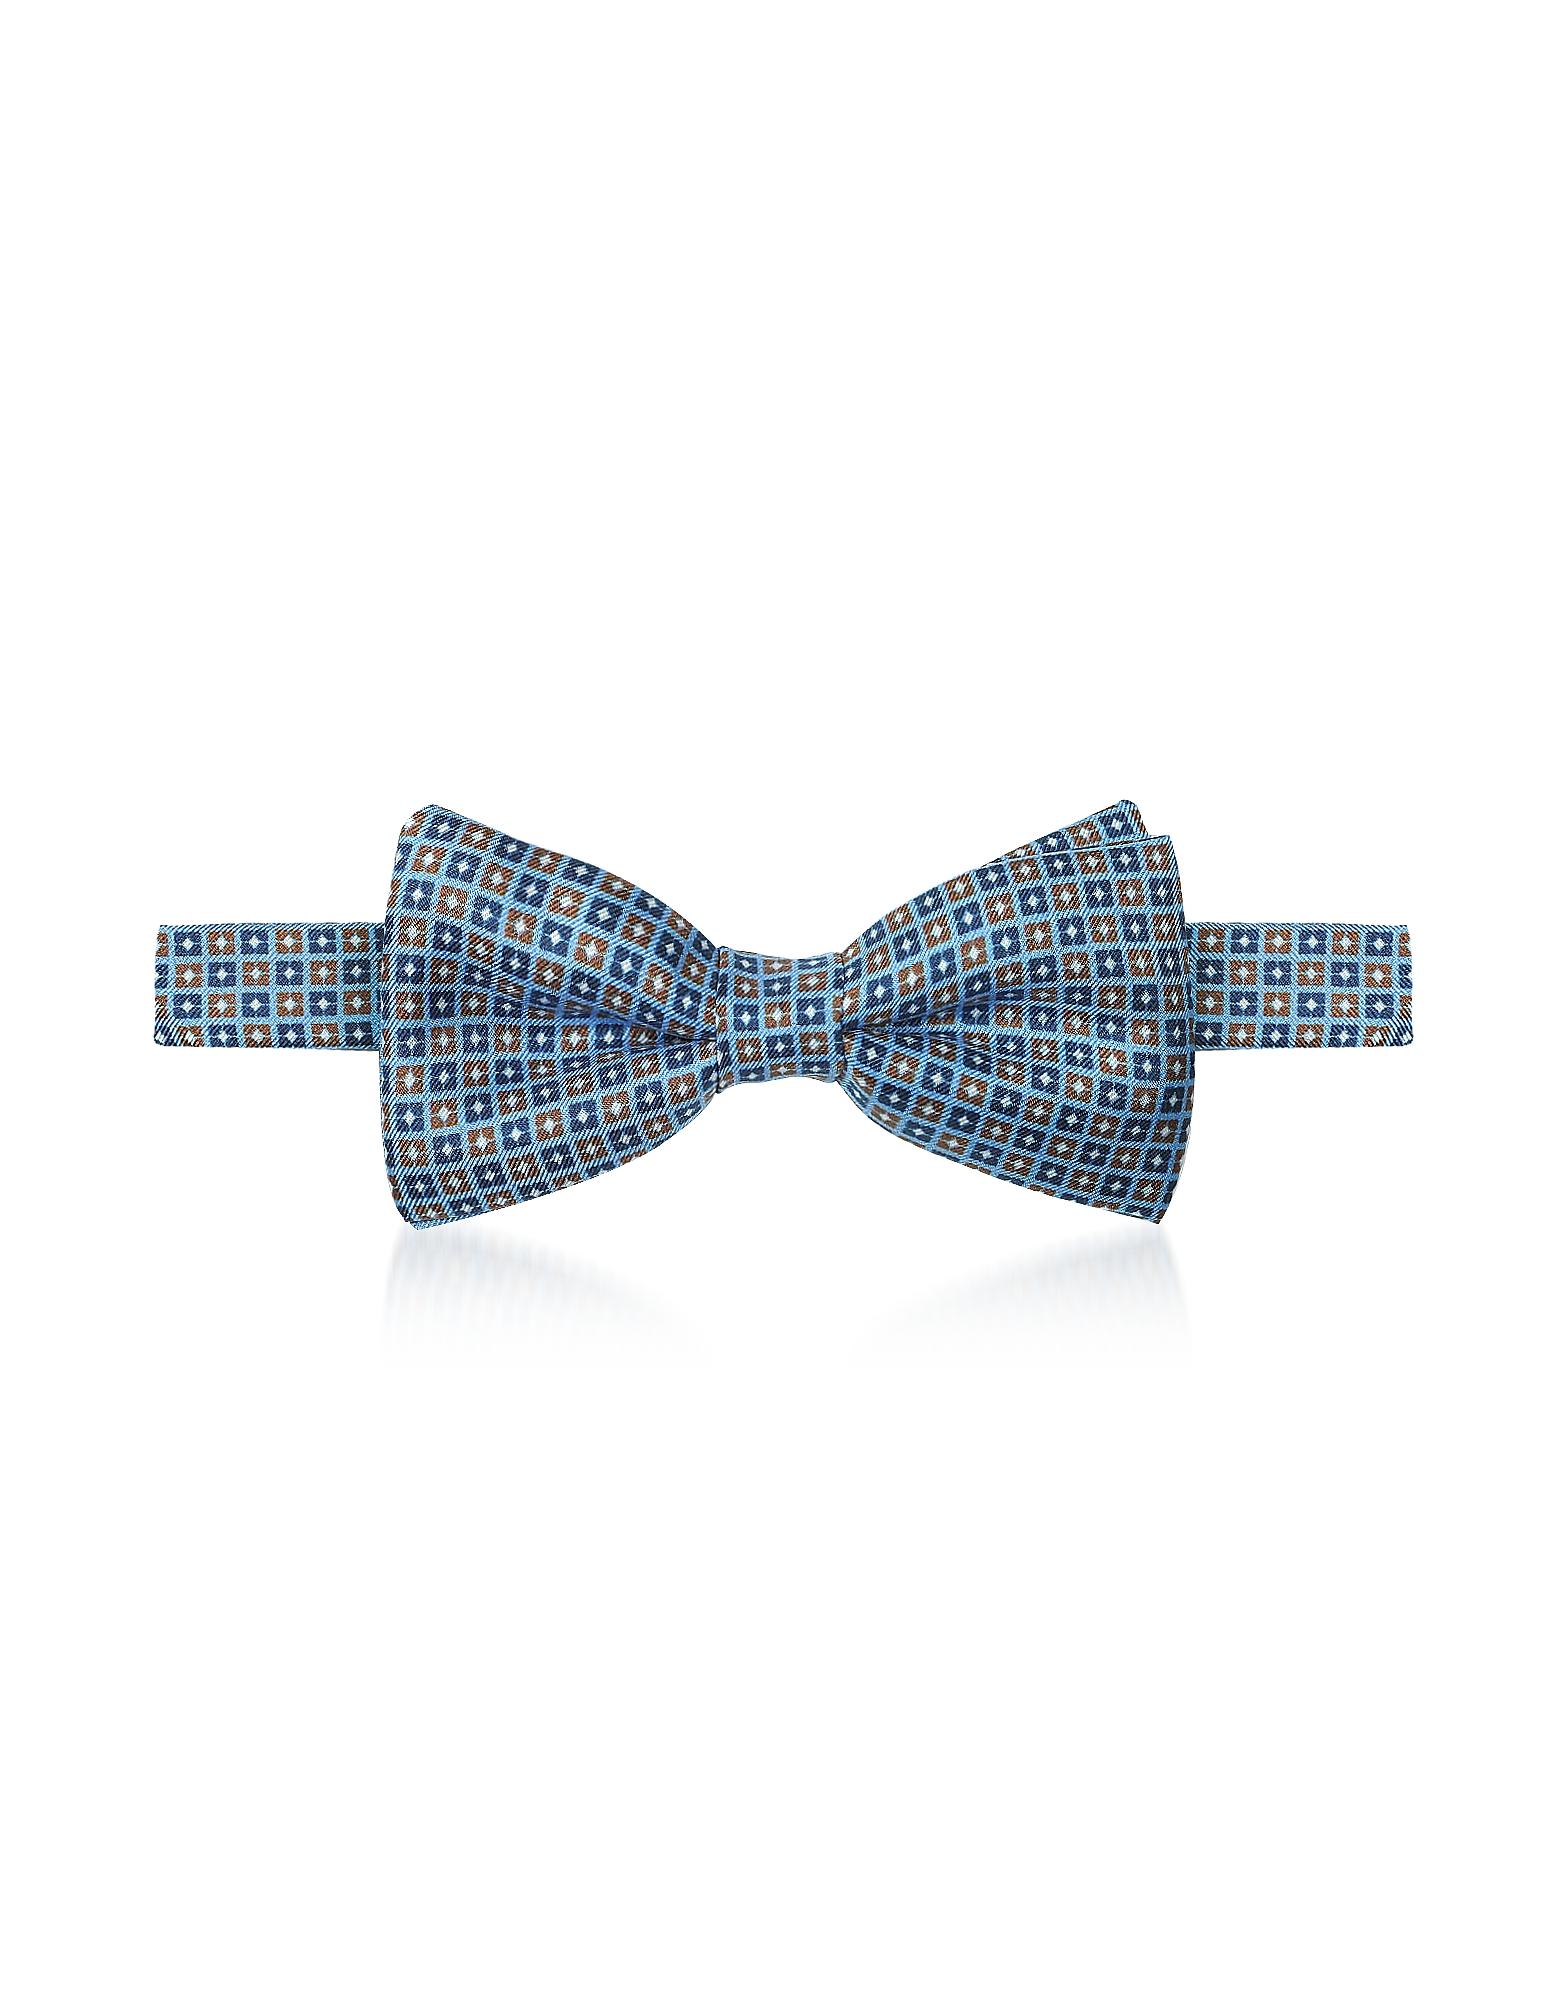 Forzieri Designer Bowties and Cummerbunds, Geometric Printed Silk Pre-Tied Bow Tie